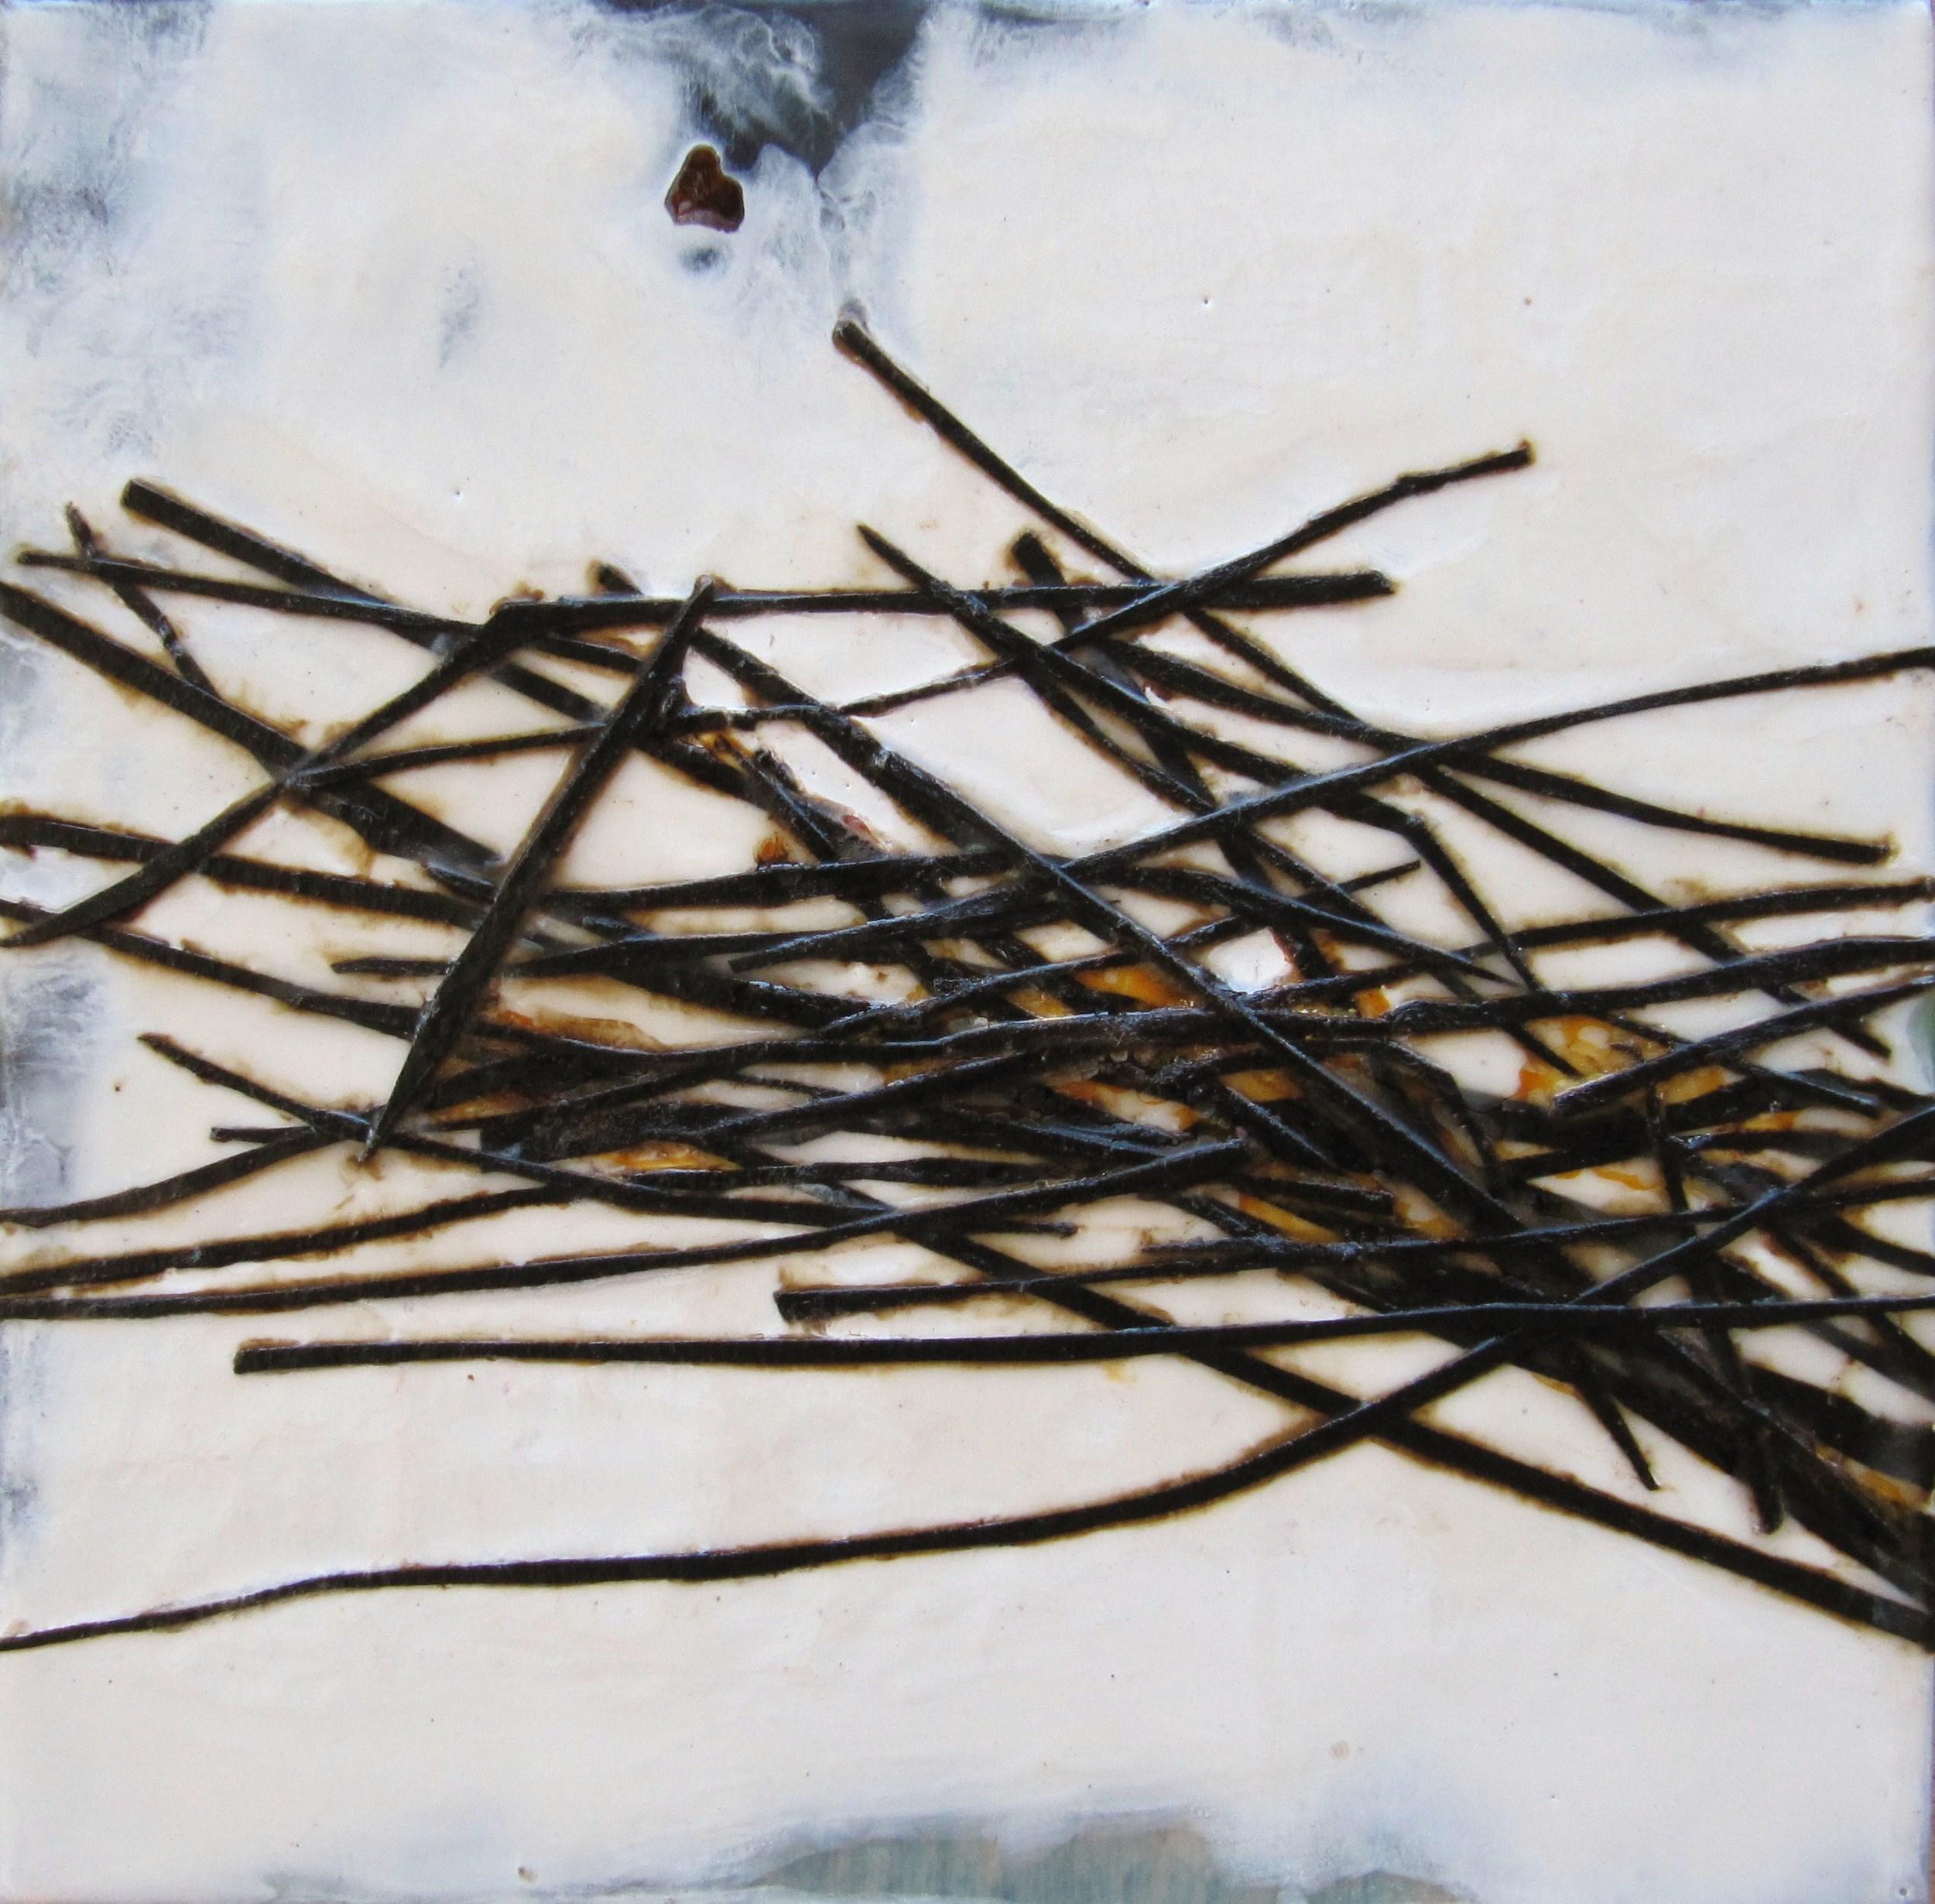 Styx, 2009 / Encaustic on wood panel, 10 x 10 / Sold